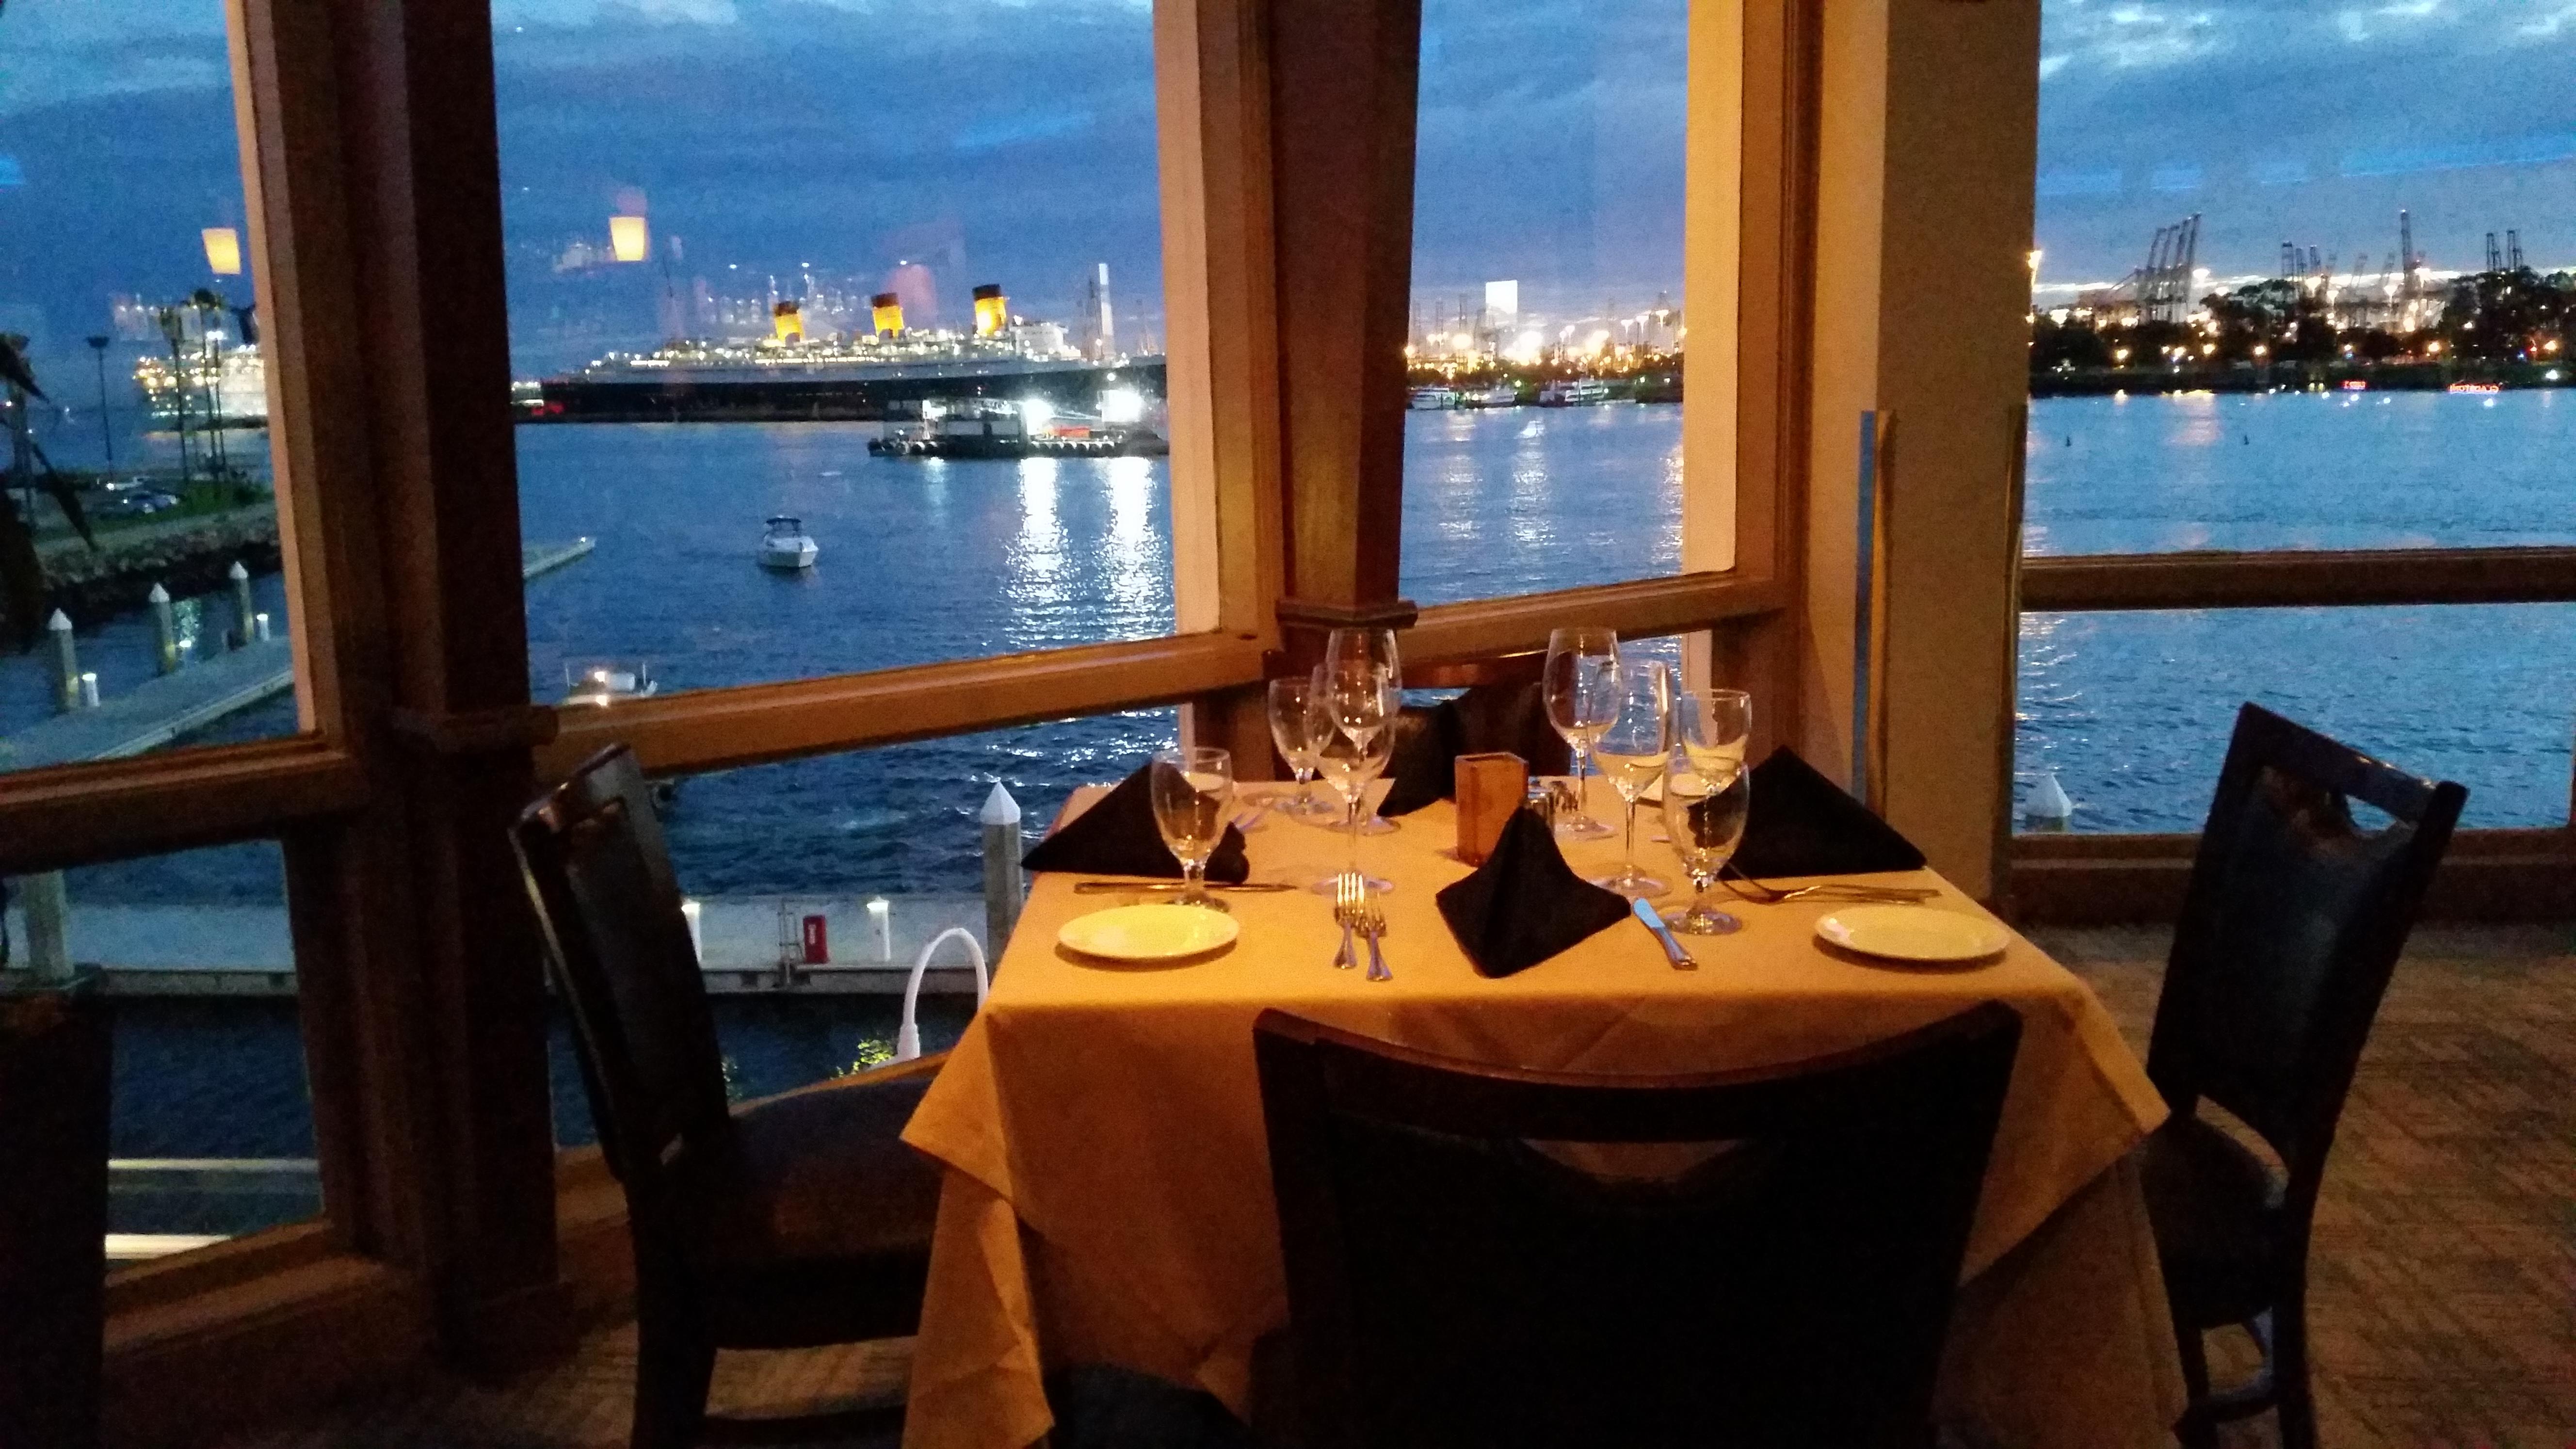 Steak House In Long Beach Part - 42: Queensview Steakhouse